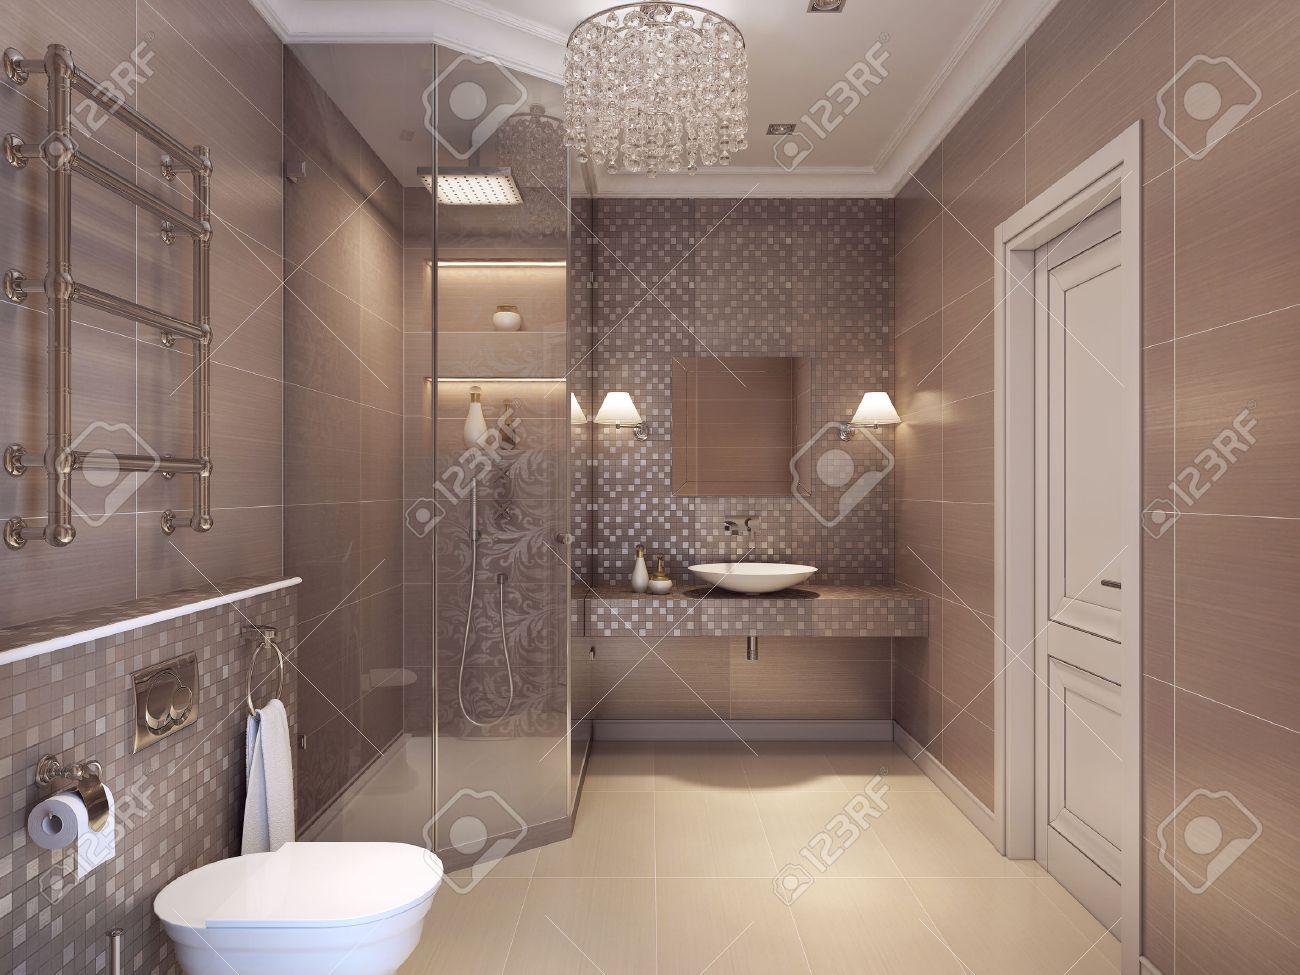 Bagni Mosaico Muratura : Bagni mosaico muratura. Bagno muratura ...